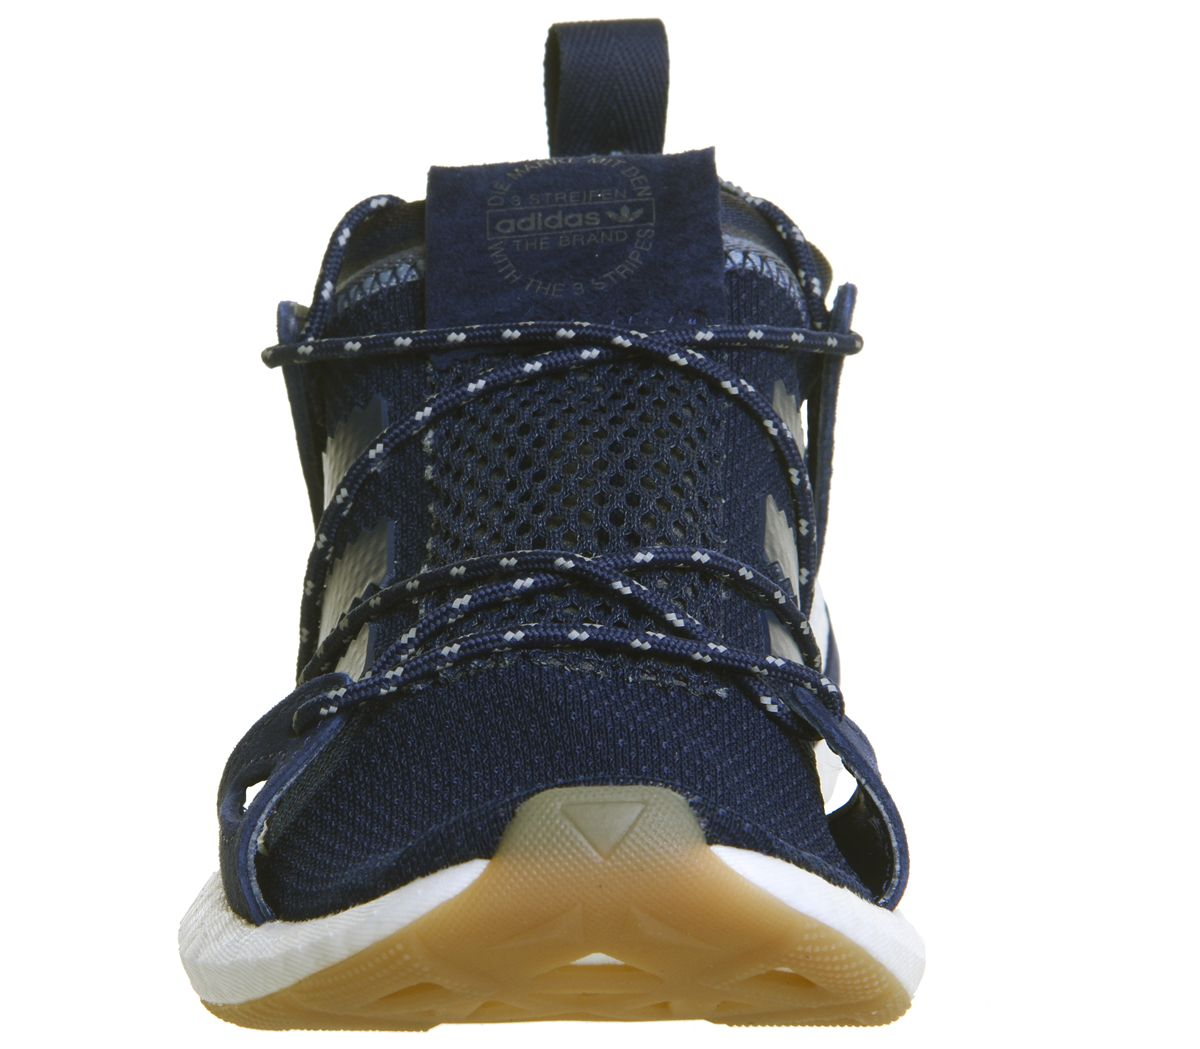 Mujer-Adidas-Arkyn-Zapatillas-Universo-Azul-Oscuro-Goma-Zapatillas-Deportivas miniatura 6